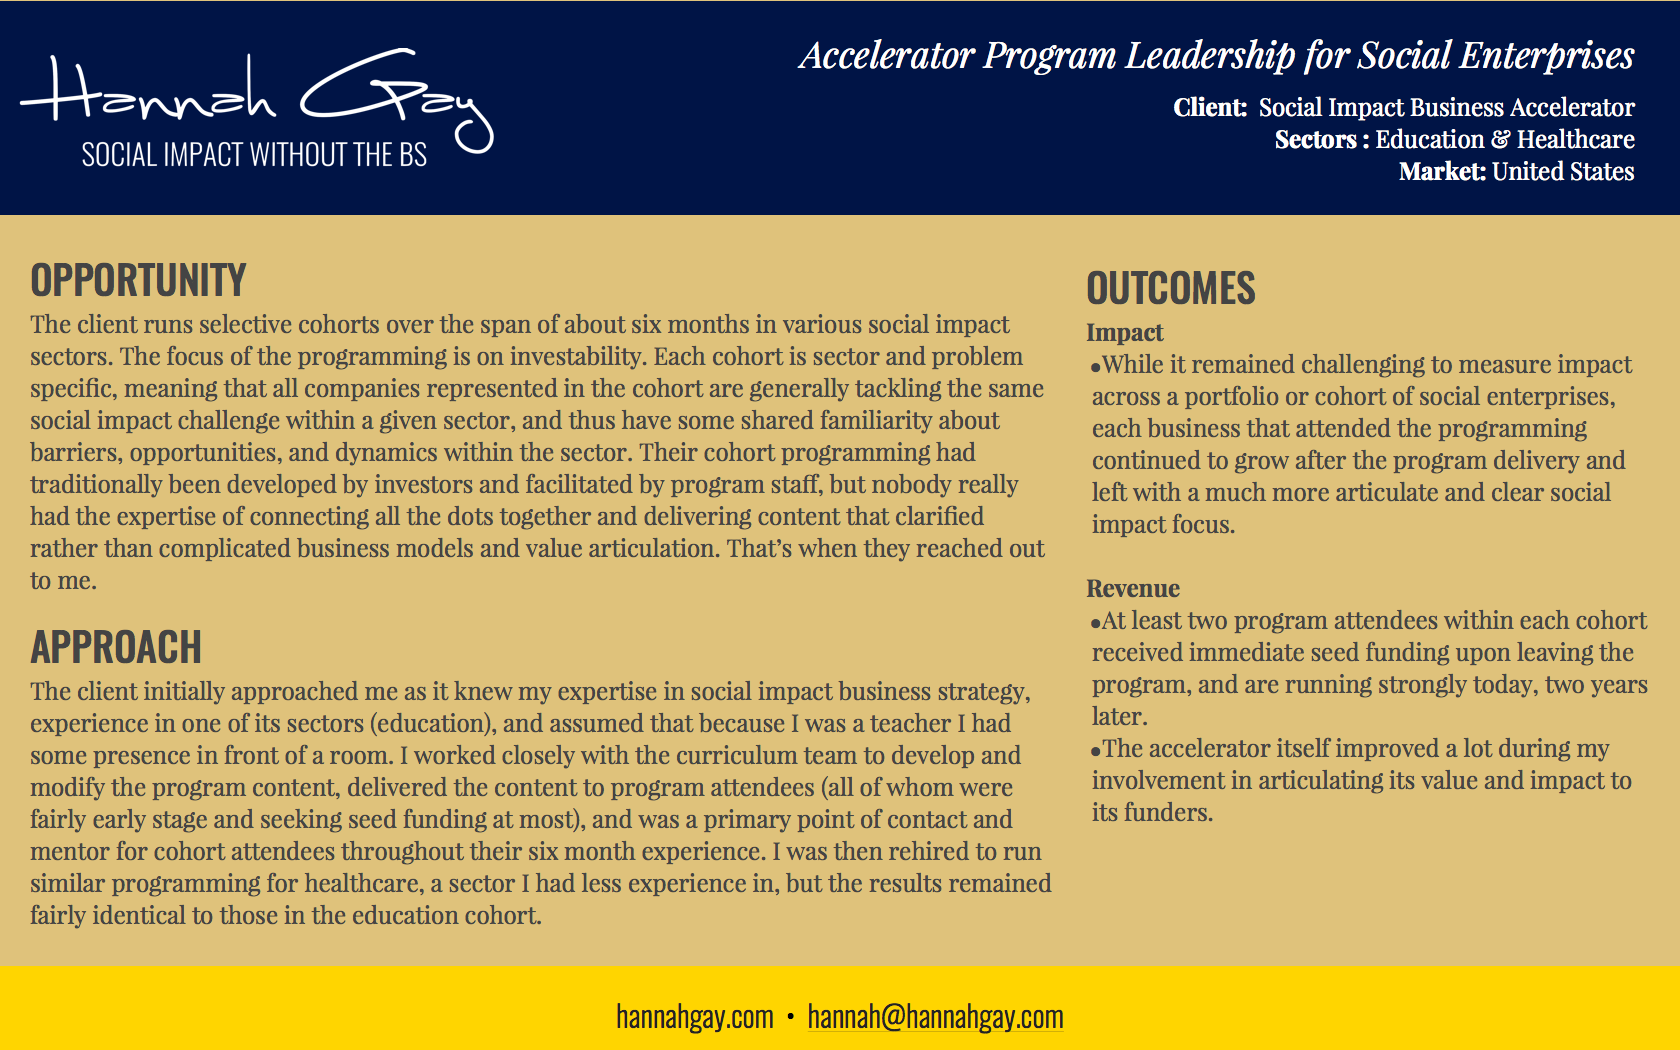 Accelerator Program Leadership for Social Enterprises.png